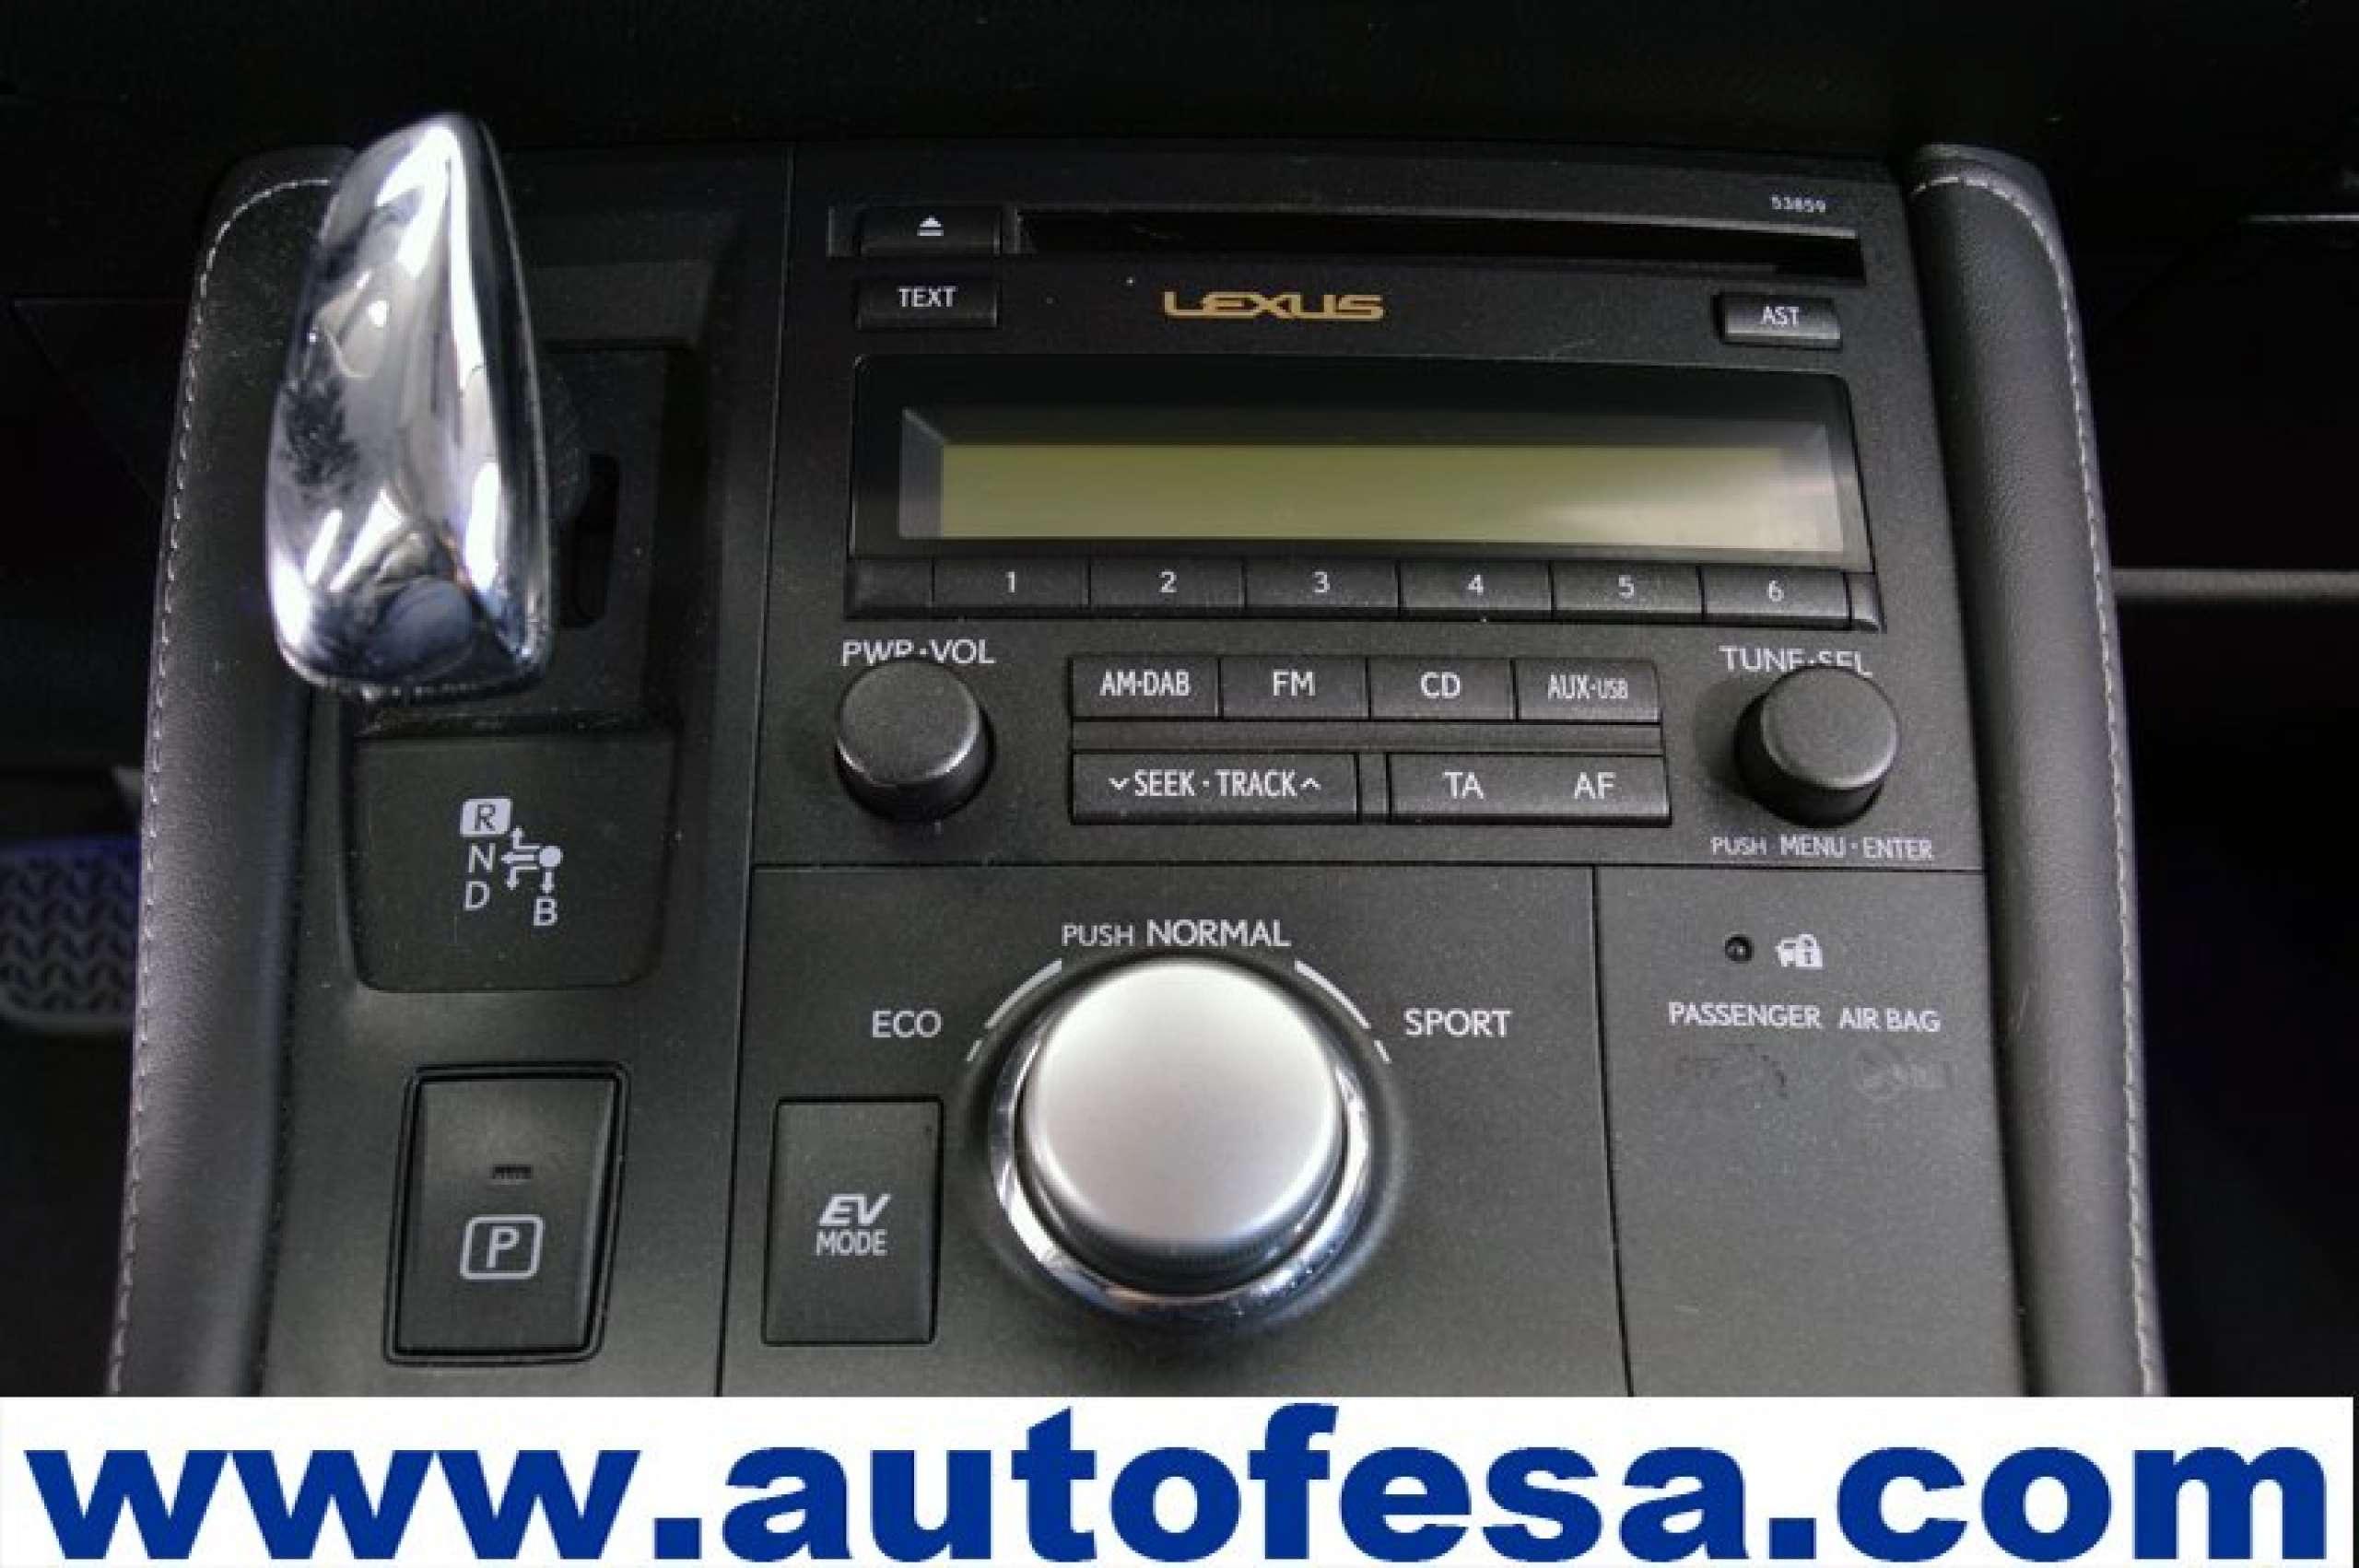 Lexus Ct 200h 1.8 136cv Eco Auto 5p - Foto 25